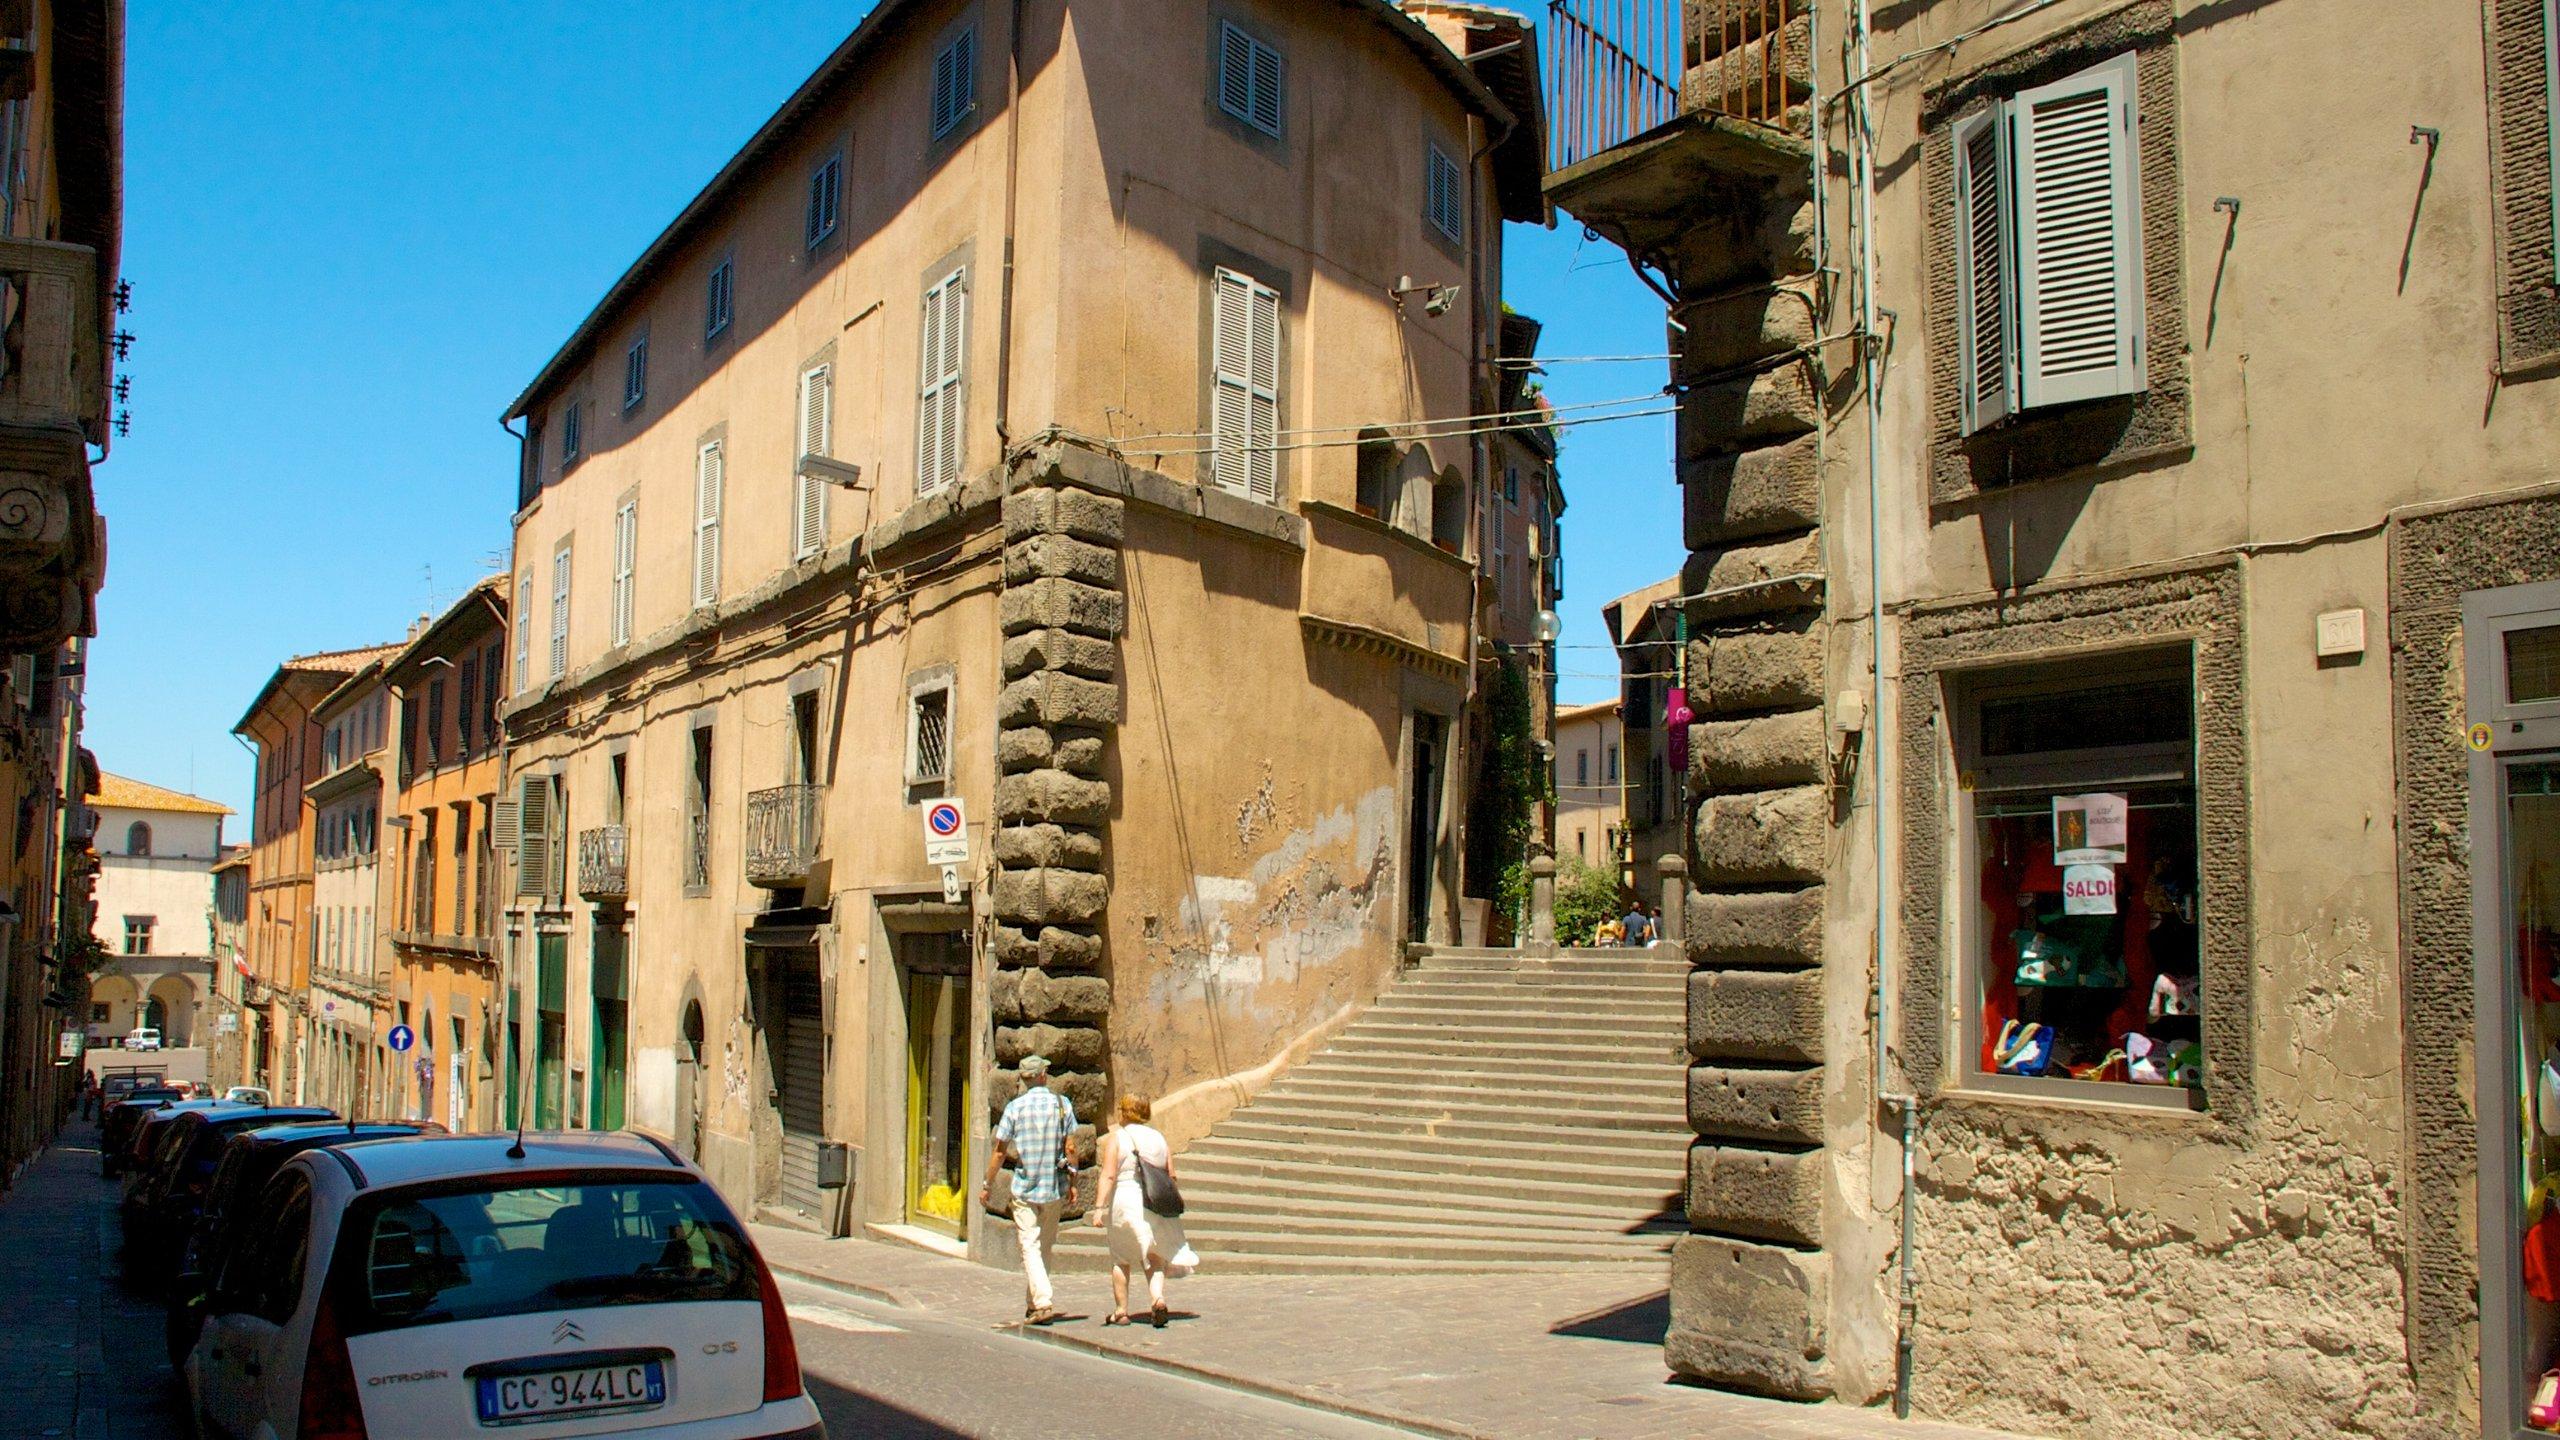 Province of Viterbo, Lazio, Italy